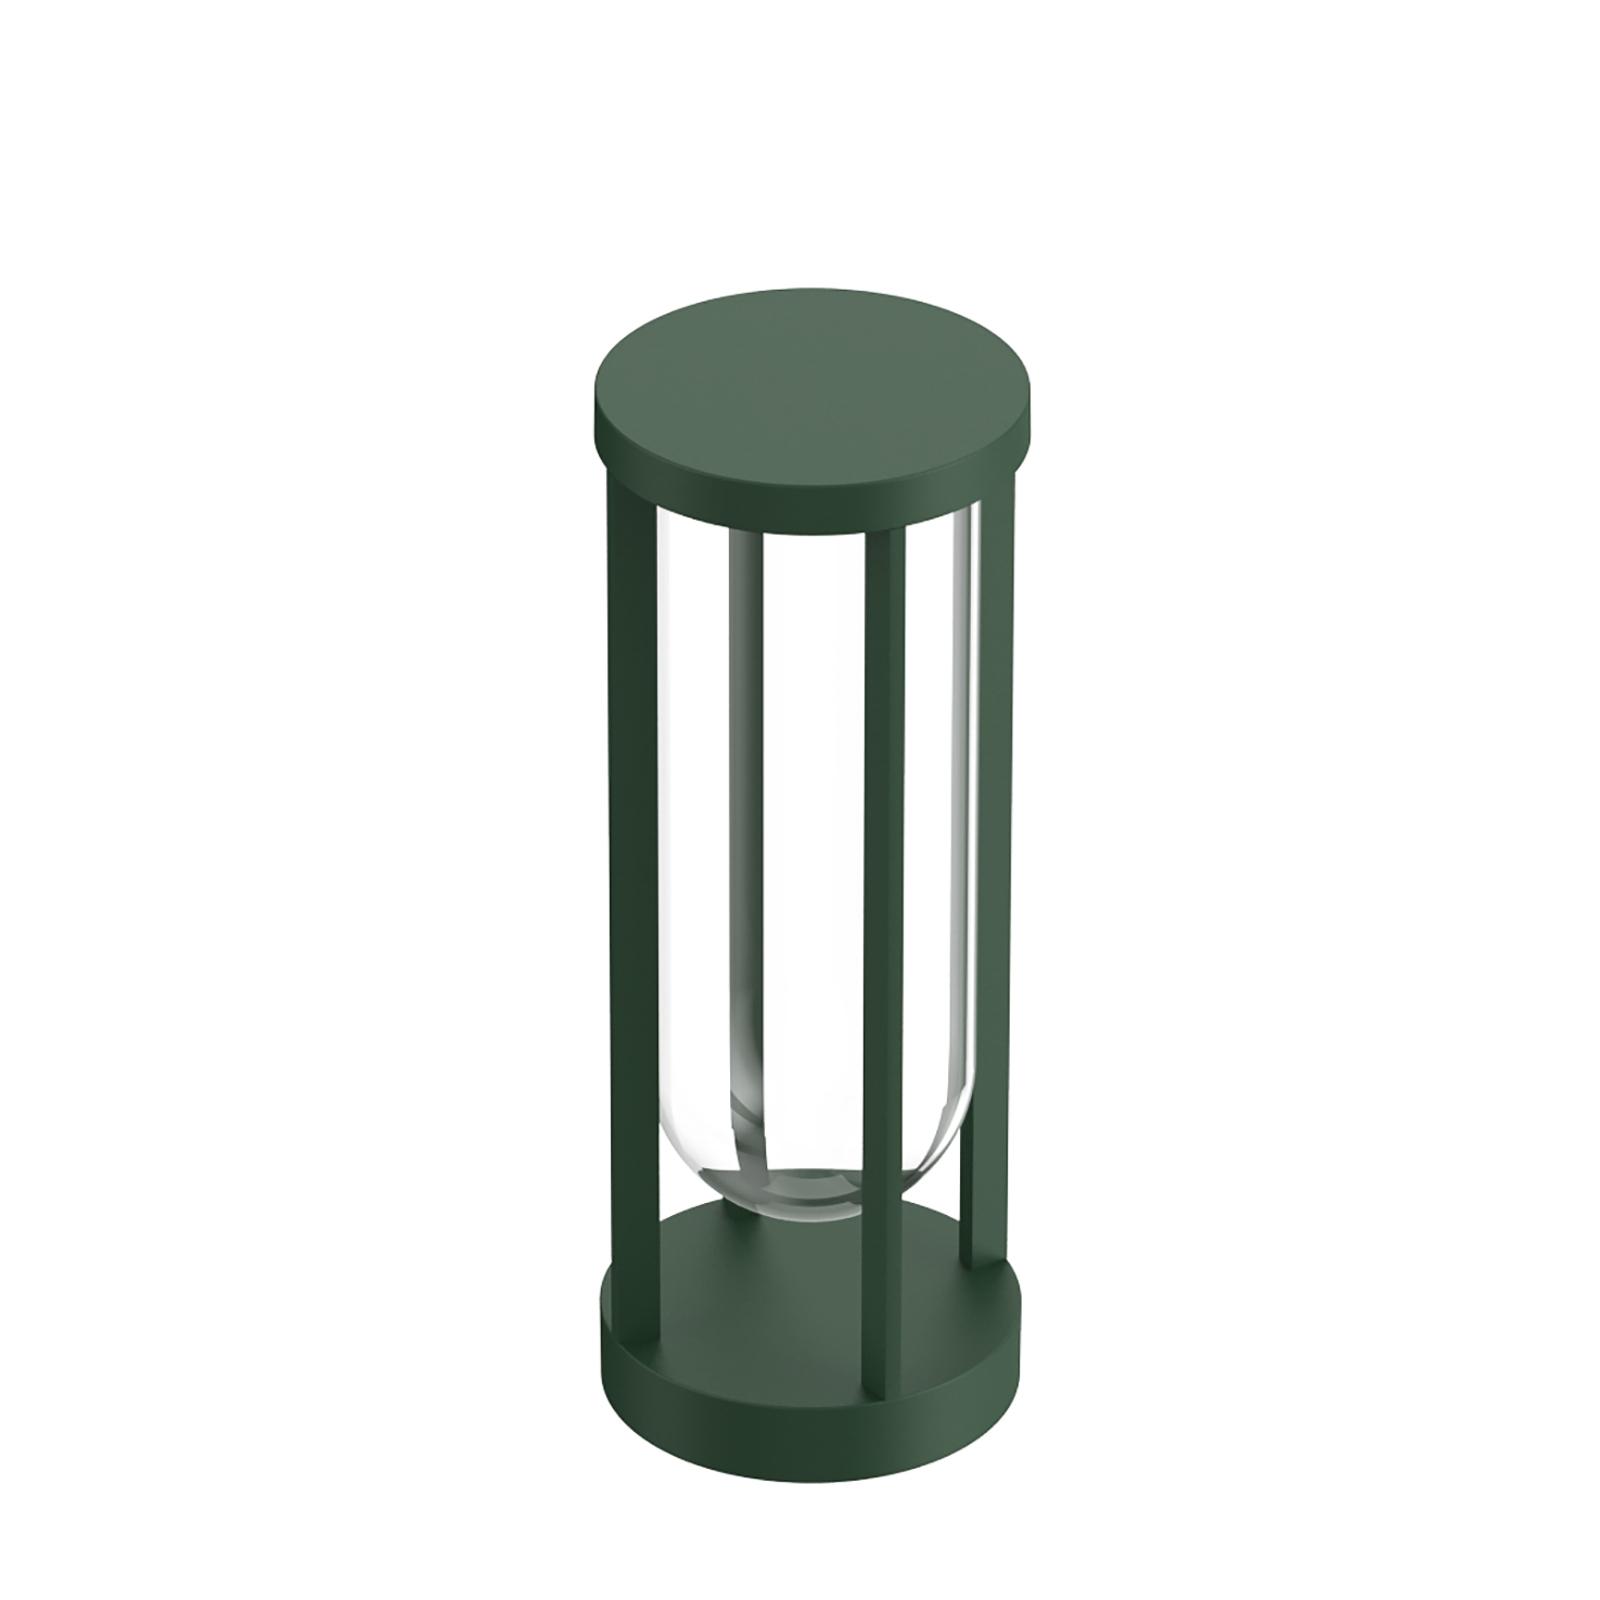 FLOS In Vitro Bollard 1, 2700K, 40 cm mörkgrön